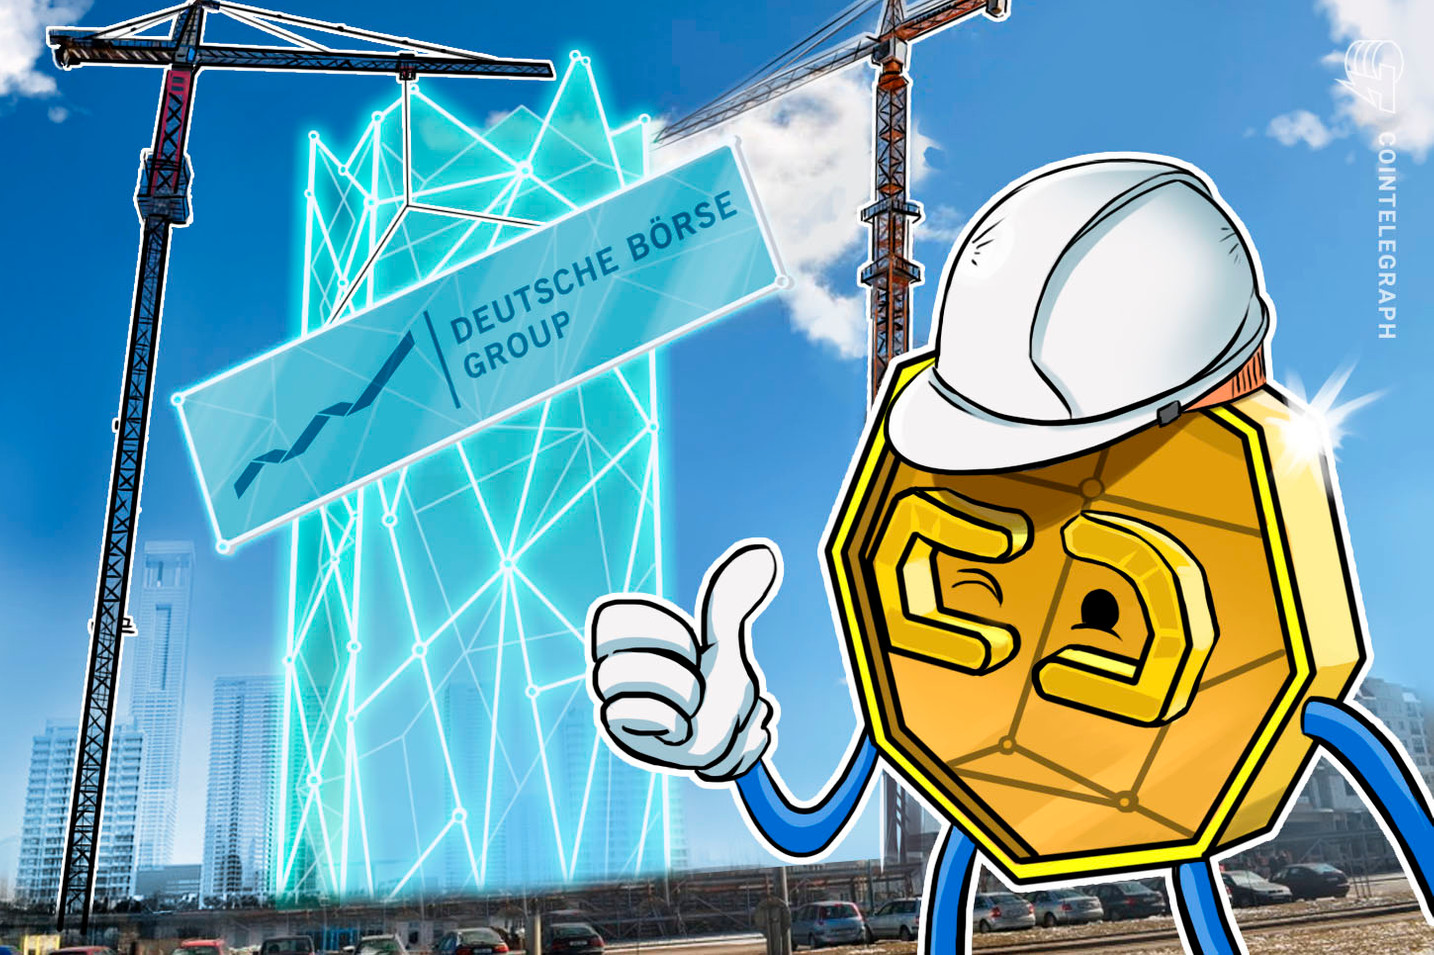 Deutsche Boerse Establishes Centrally-Steered Unit Dedicated to Blockchain, Crypto Assets